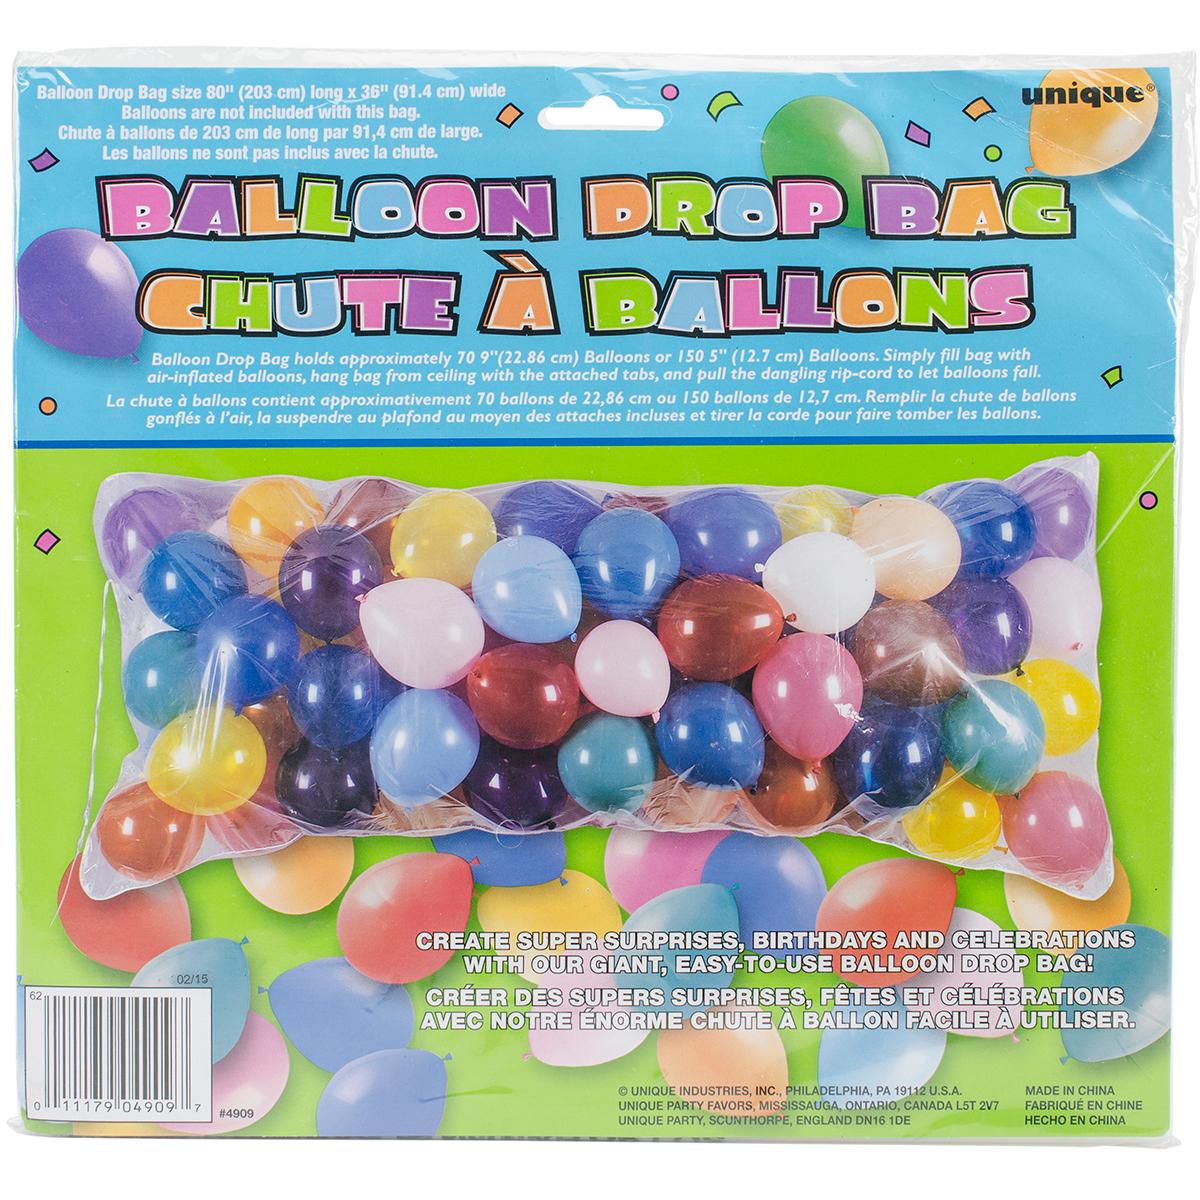 Balloon Drop Bag, 80in